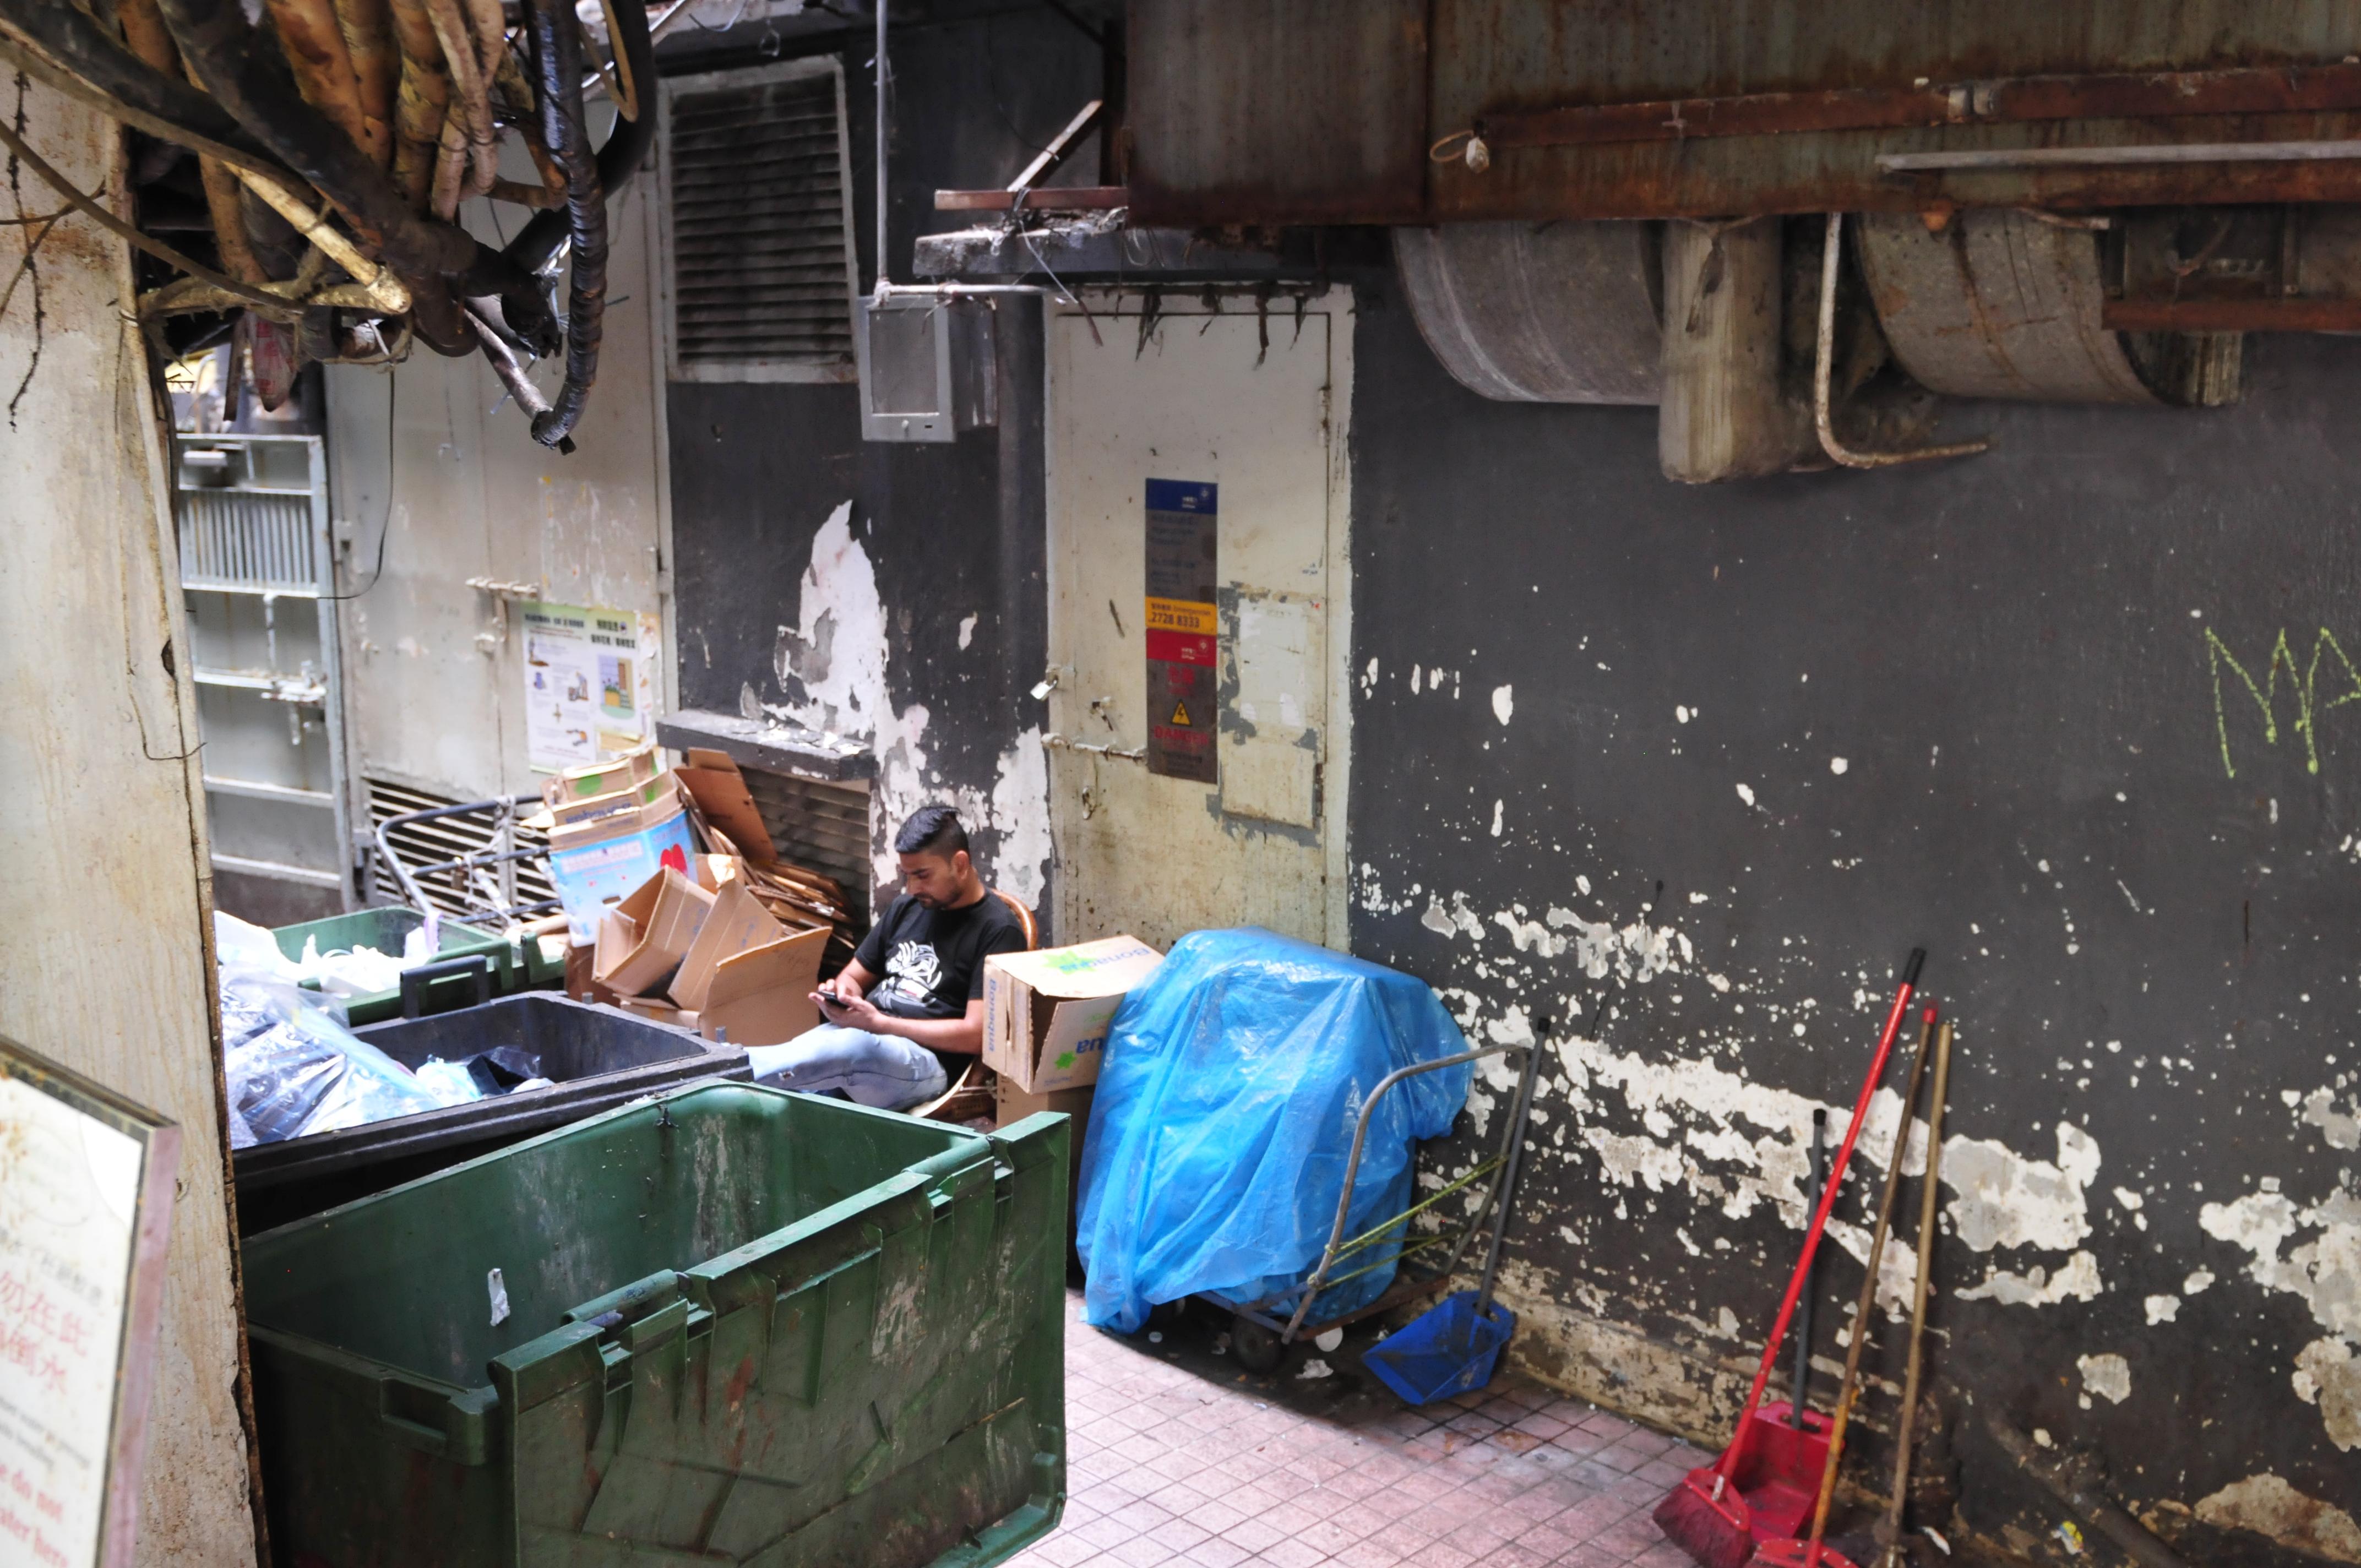 13-08-08-hongkong-by-RalfR-123.jpg